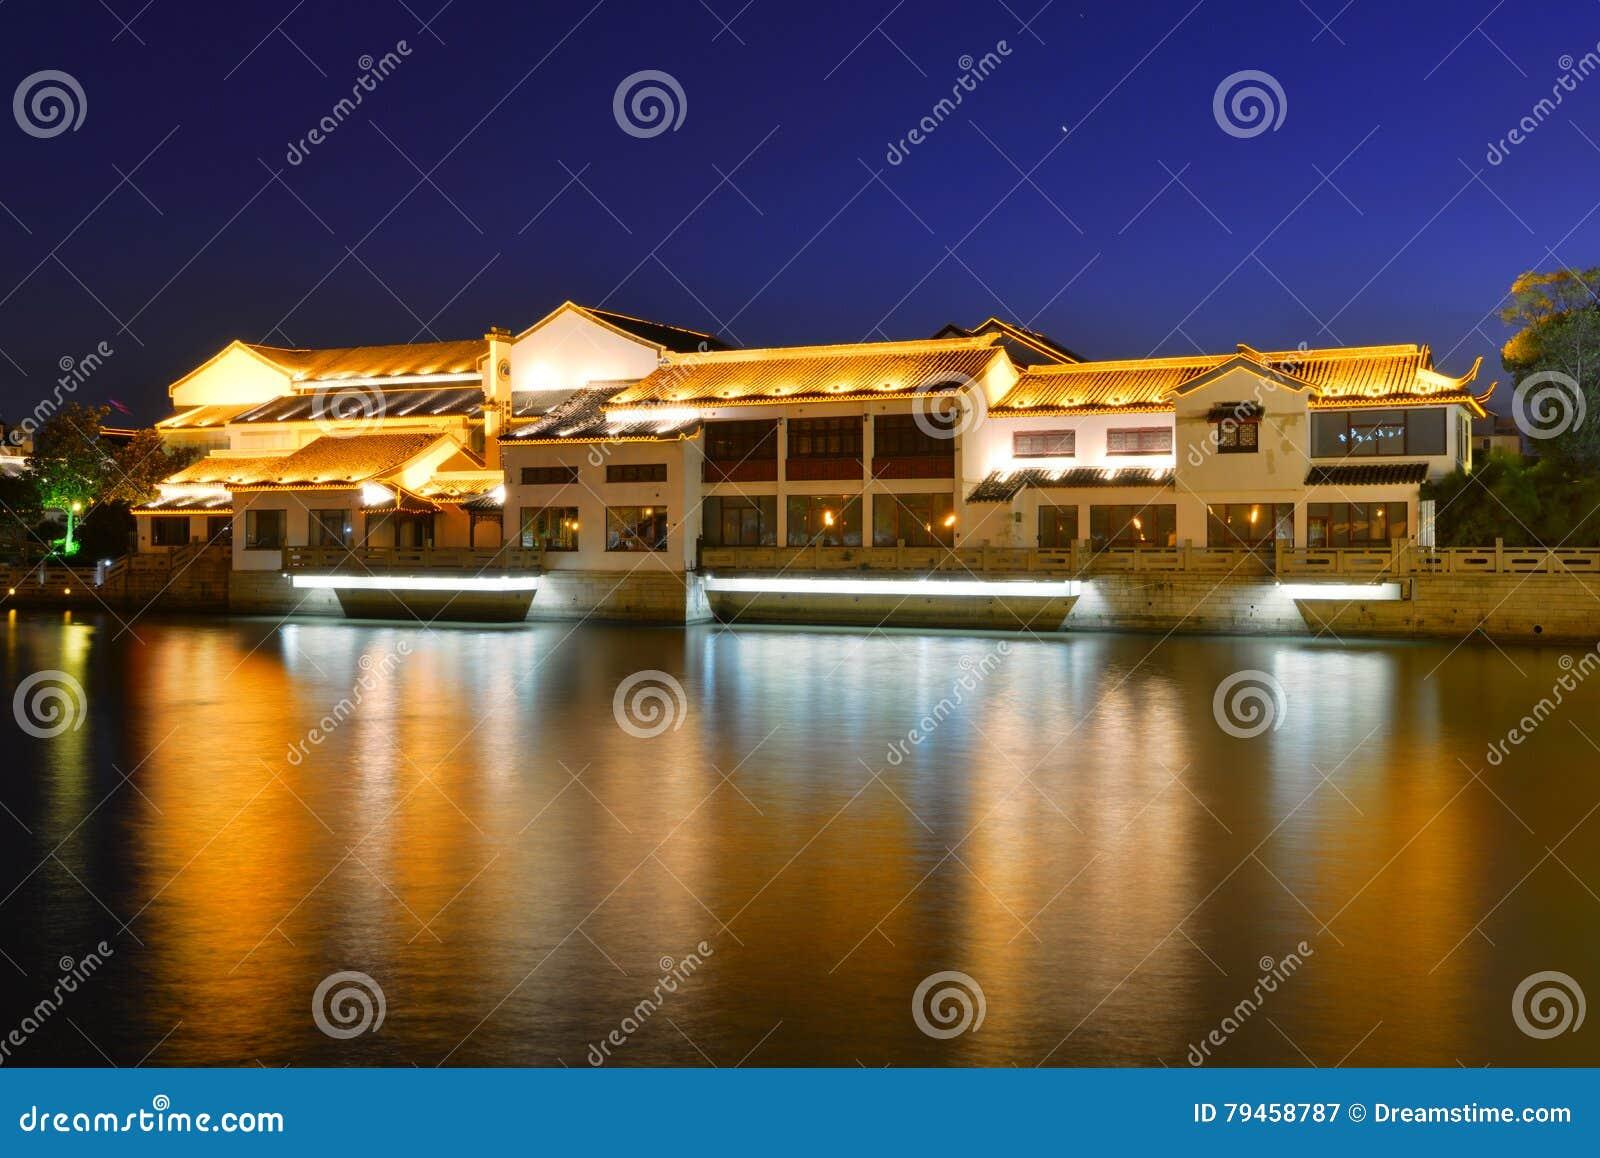 Suzhou Scenery stock image. Image of riverbank, jiangsu - 79458787